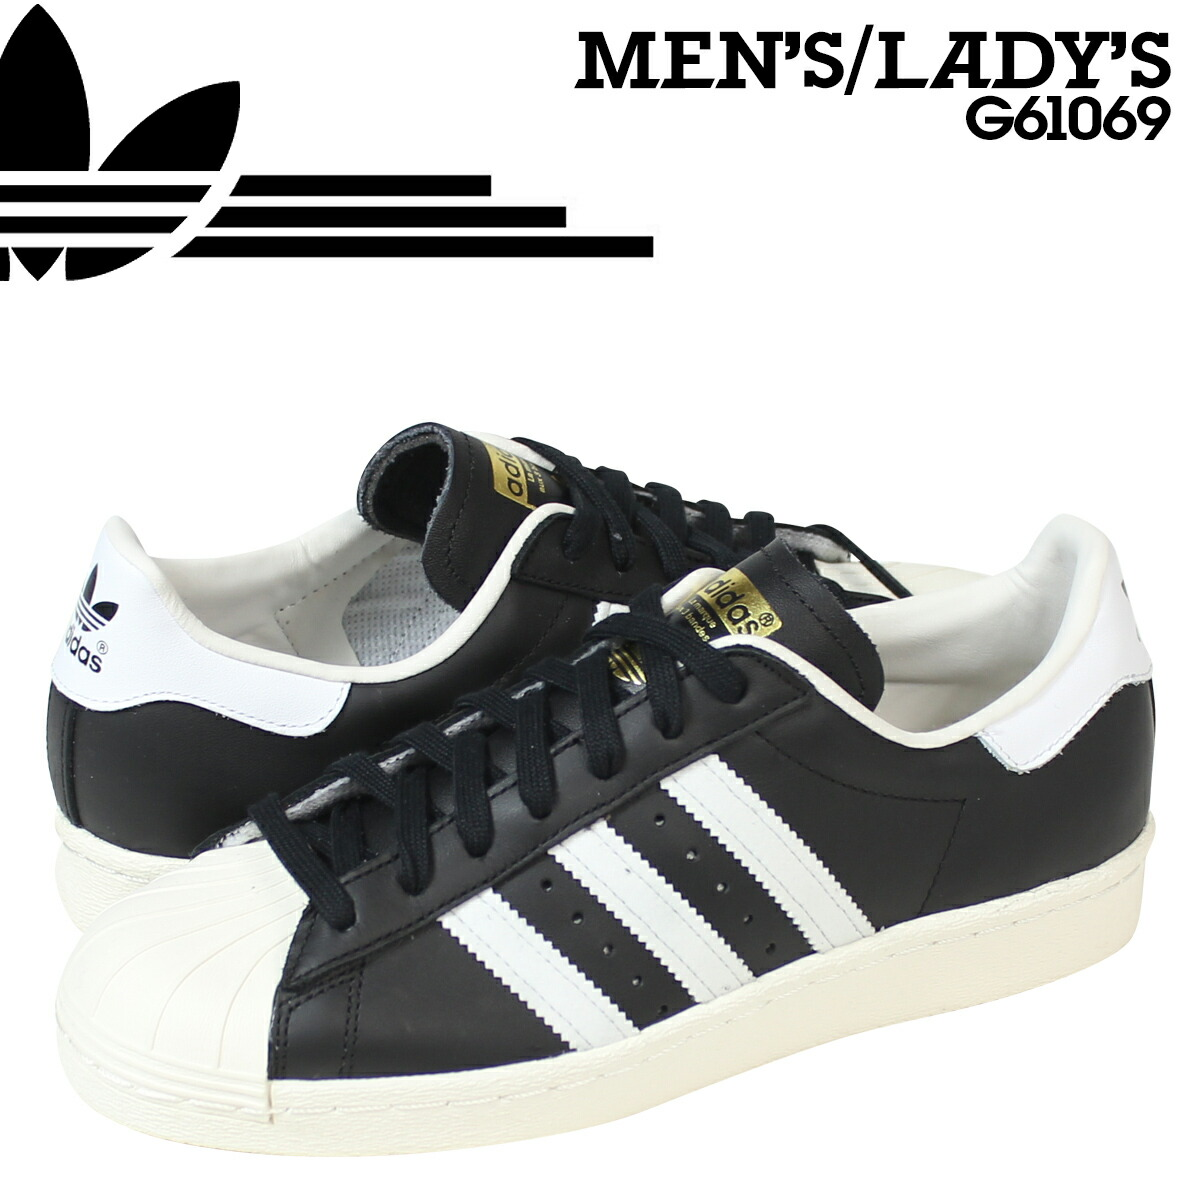 yqfzb SneaK Online Shop | Rakuten Global Market: Adidas originals adidas